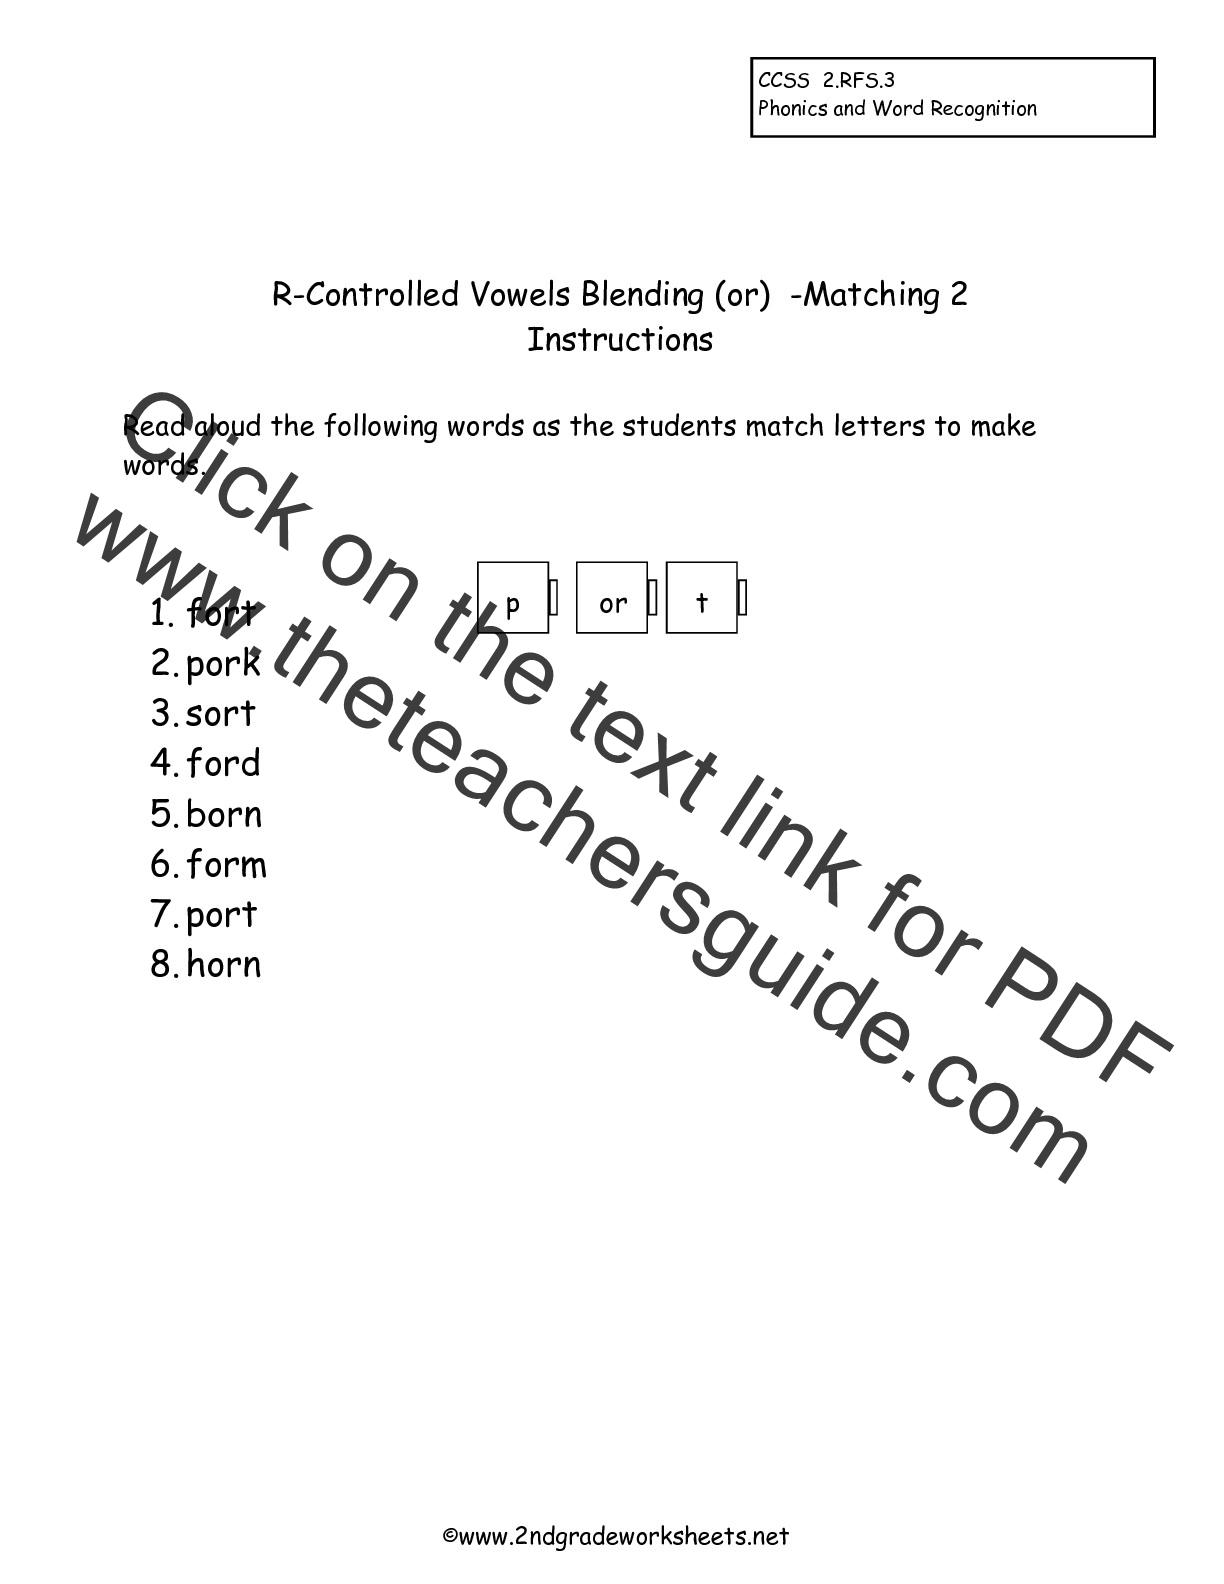 worksheet R Controlled Worksheets second grade phonics worksheets and flashcards worksheet